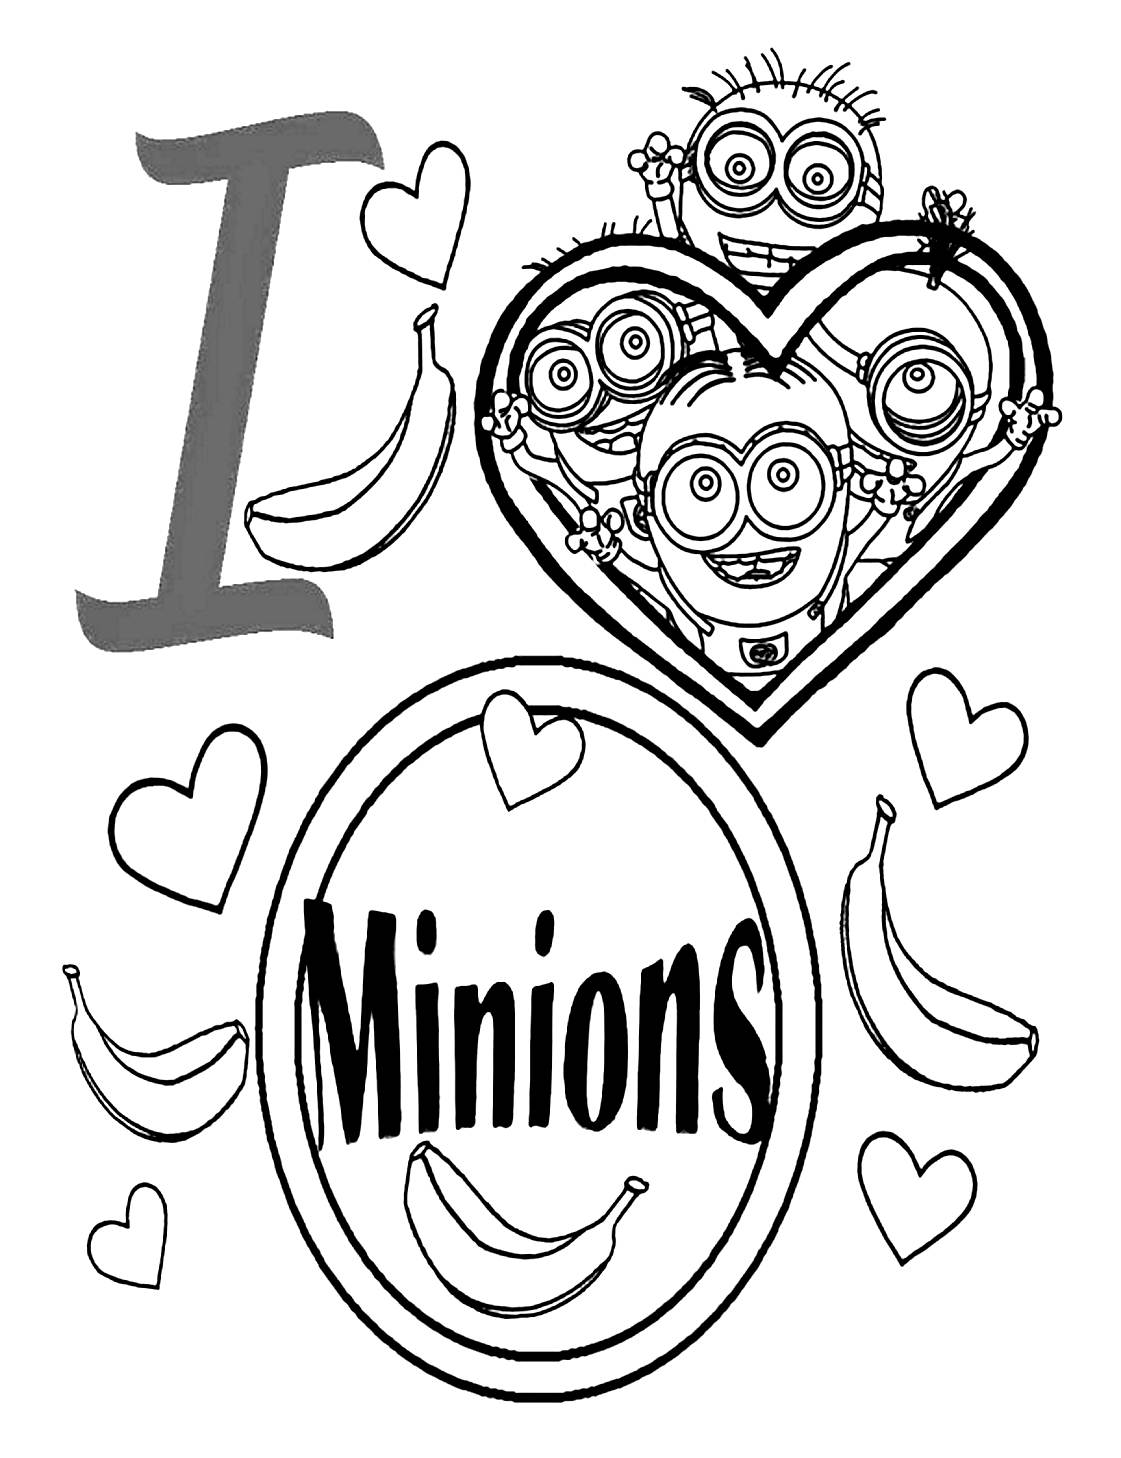 100 dibujos de Minions para colorear  Oh Kids  Page 9